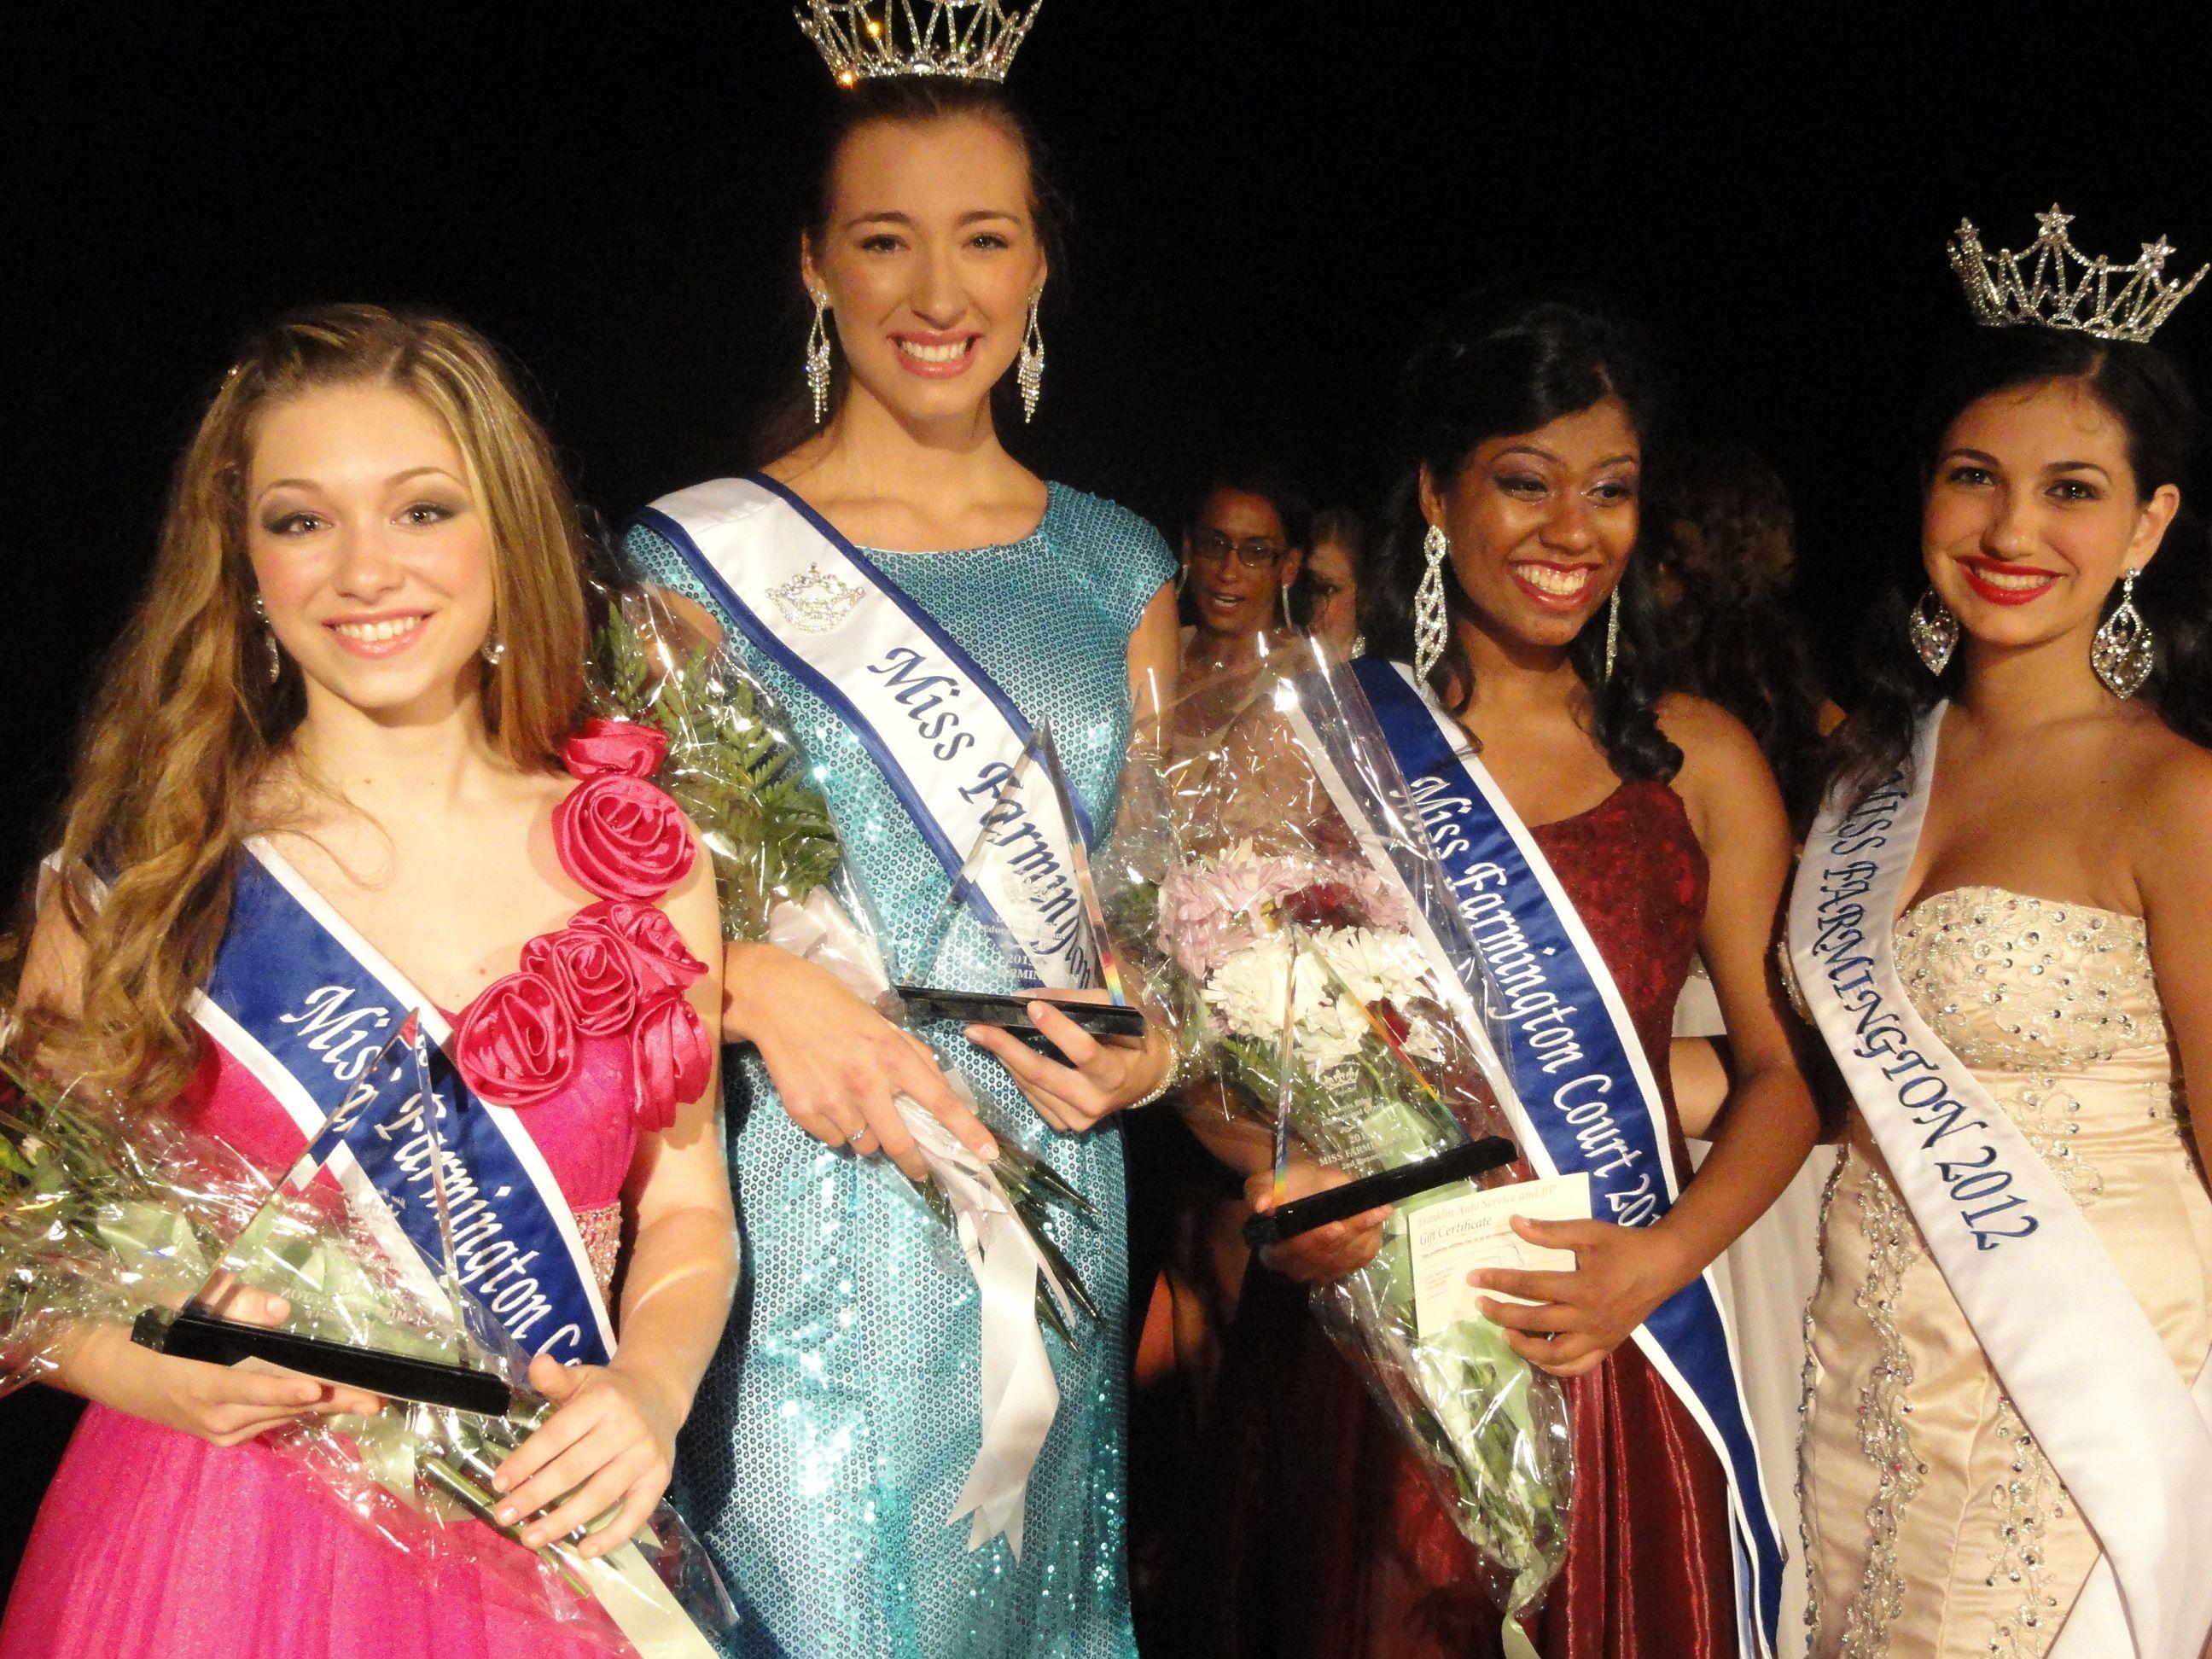 Kristina Franchi Wins 2013 Miss Farmington Title.